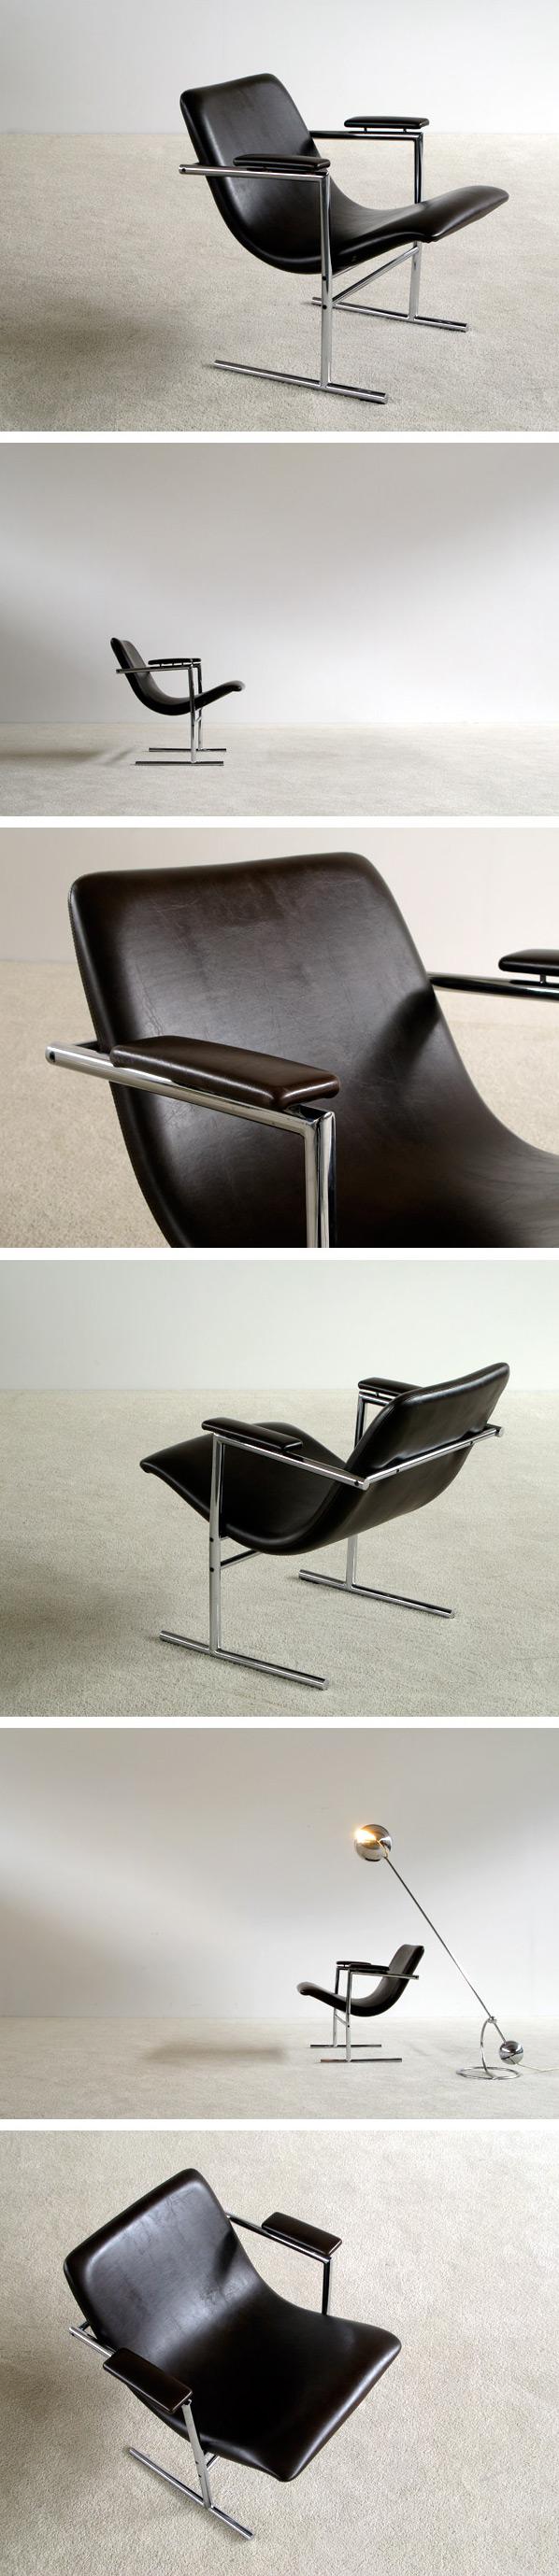 Rudi Verelst armchair Oslo for Novalux Large